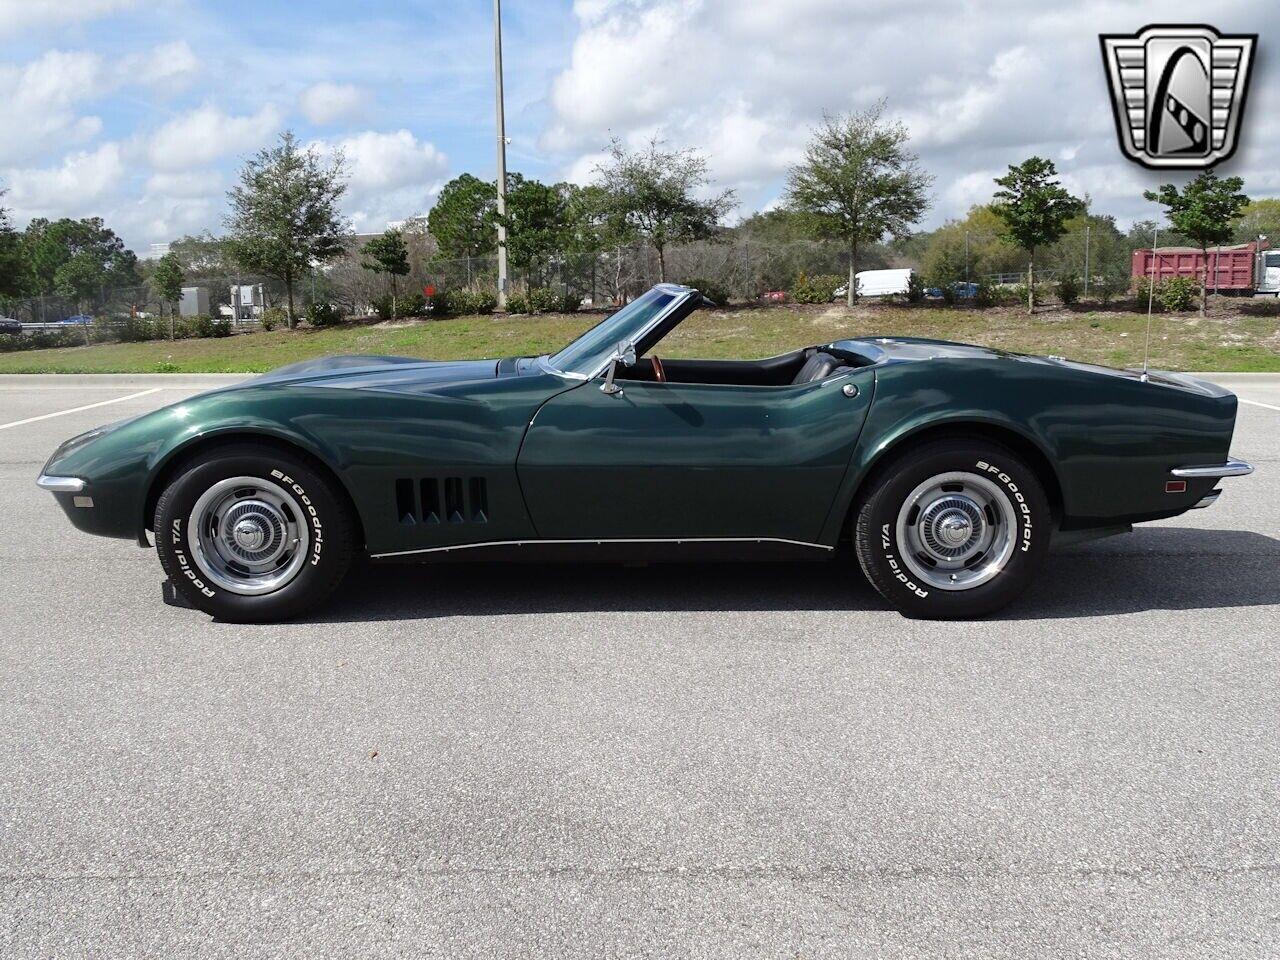 1968 Green Chevrolet Corvette   | C3 Corvette Photo 6